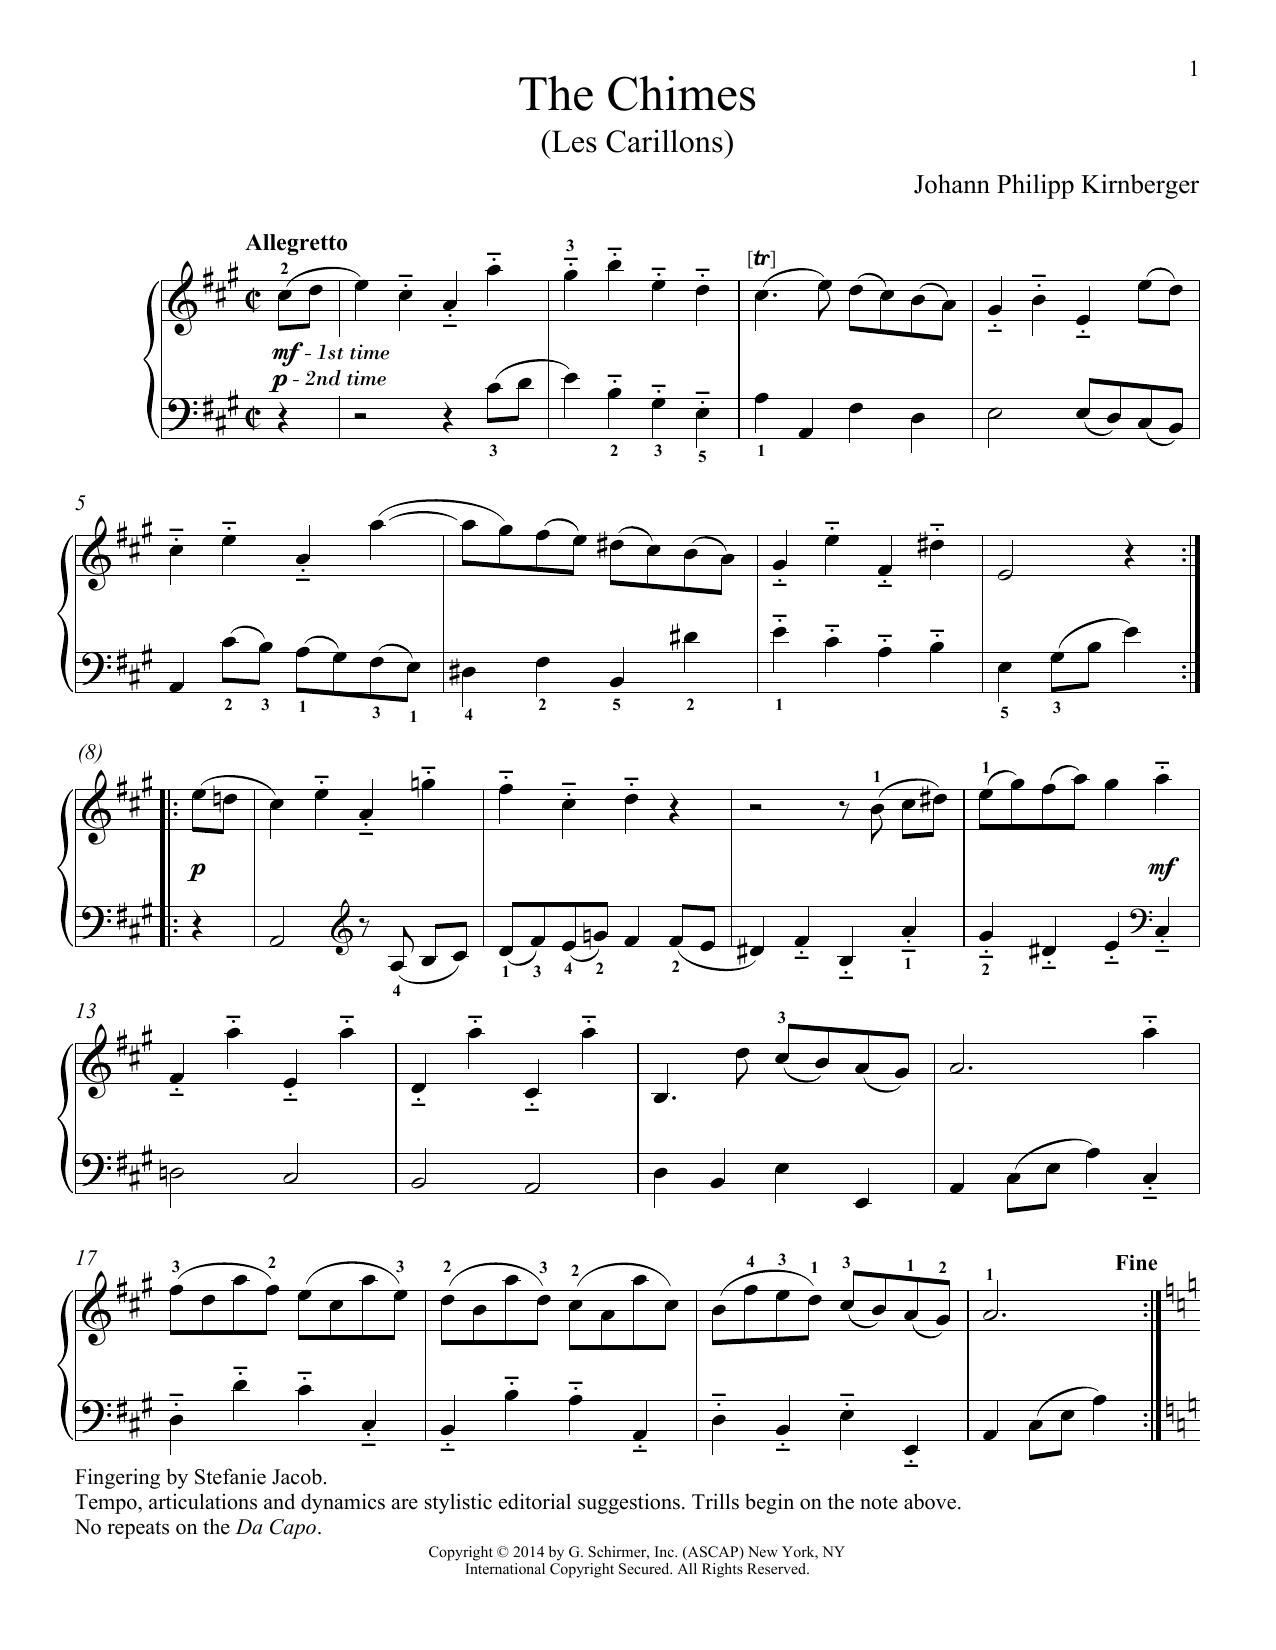 Richard Walters Les Carillons sheet music notes and chords. Download Printable PDF.